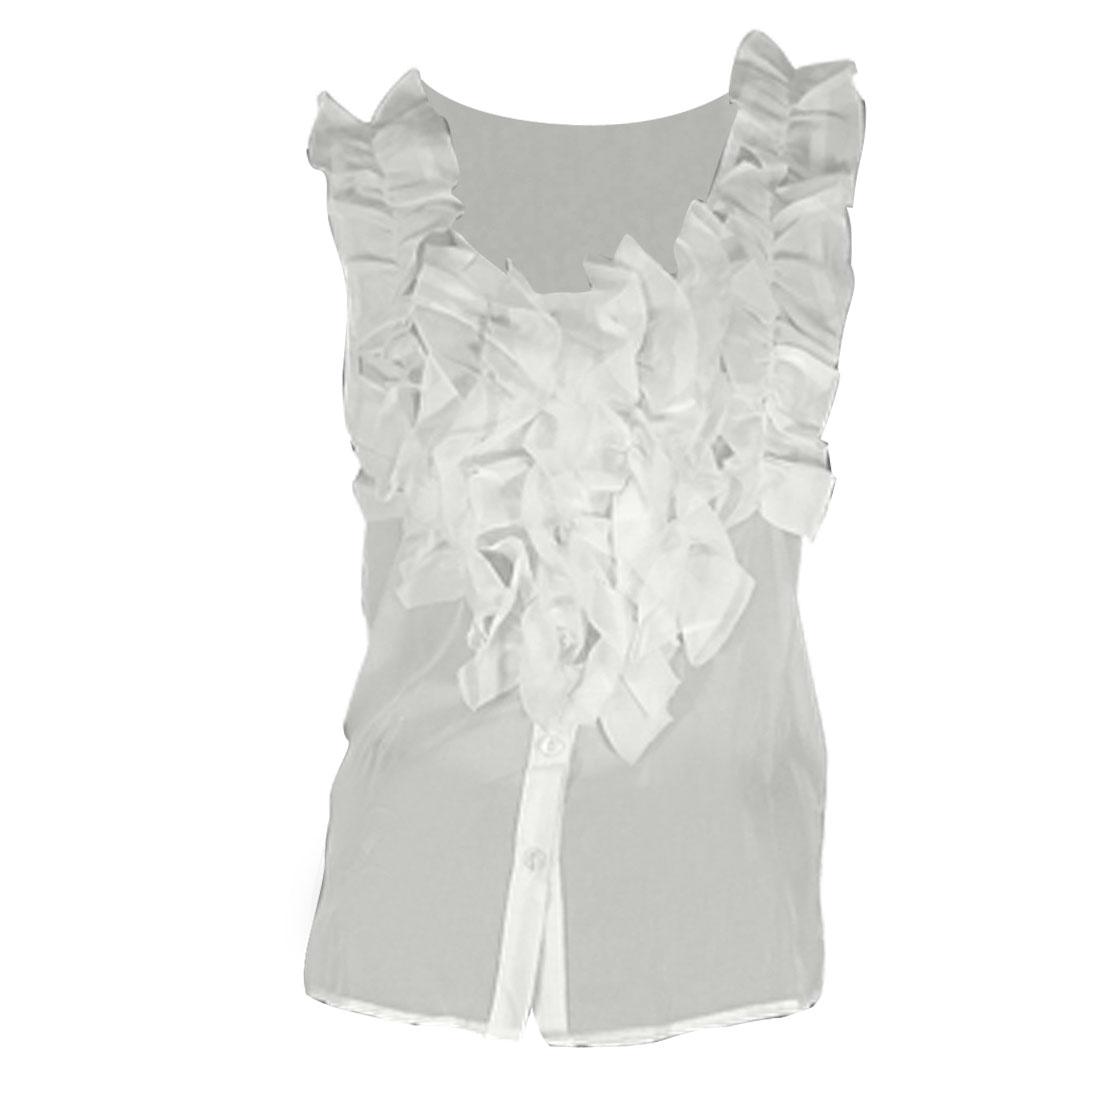 White Scoop Neckline Sleeveless w Ruffle Decoration Ladies Blouse XS